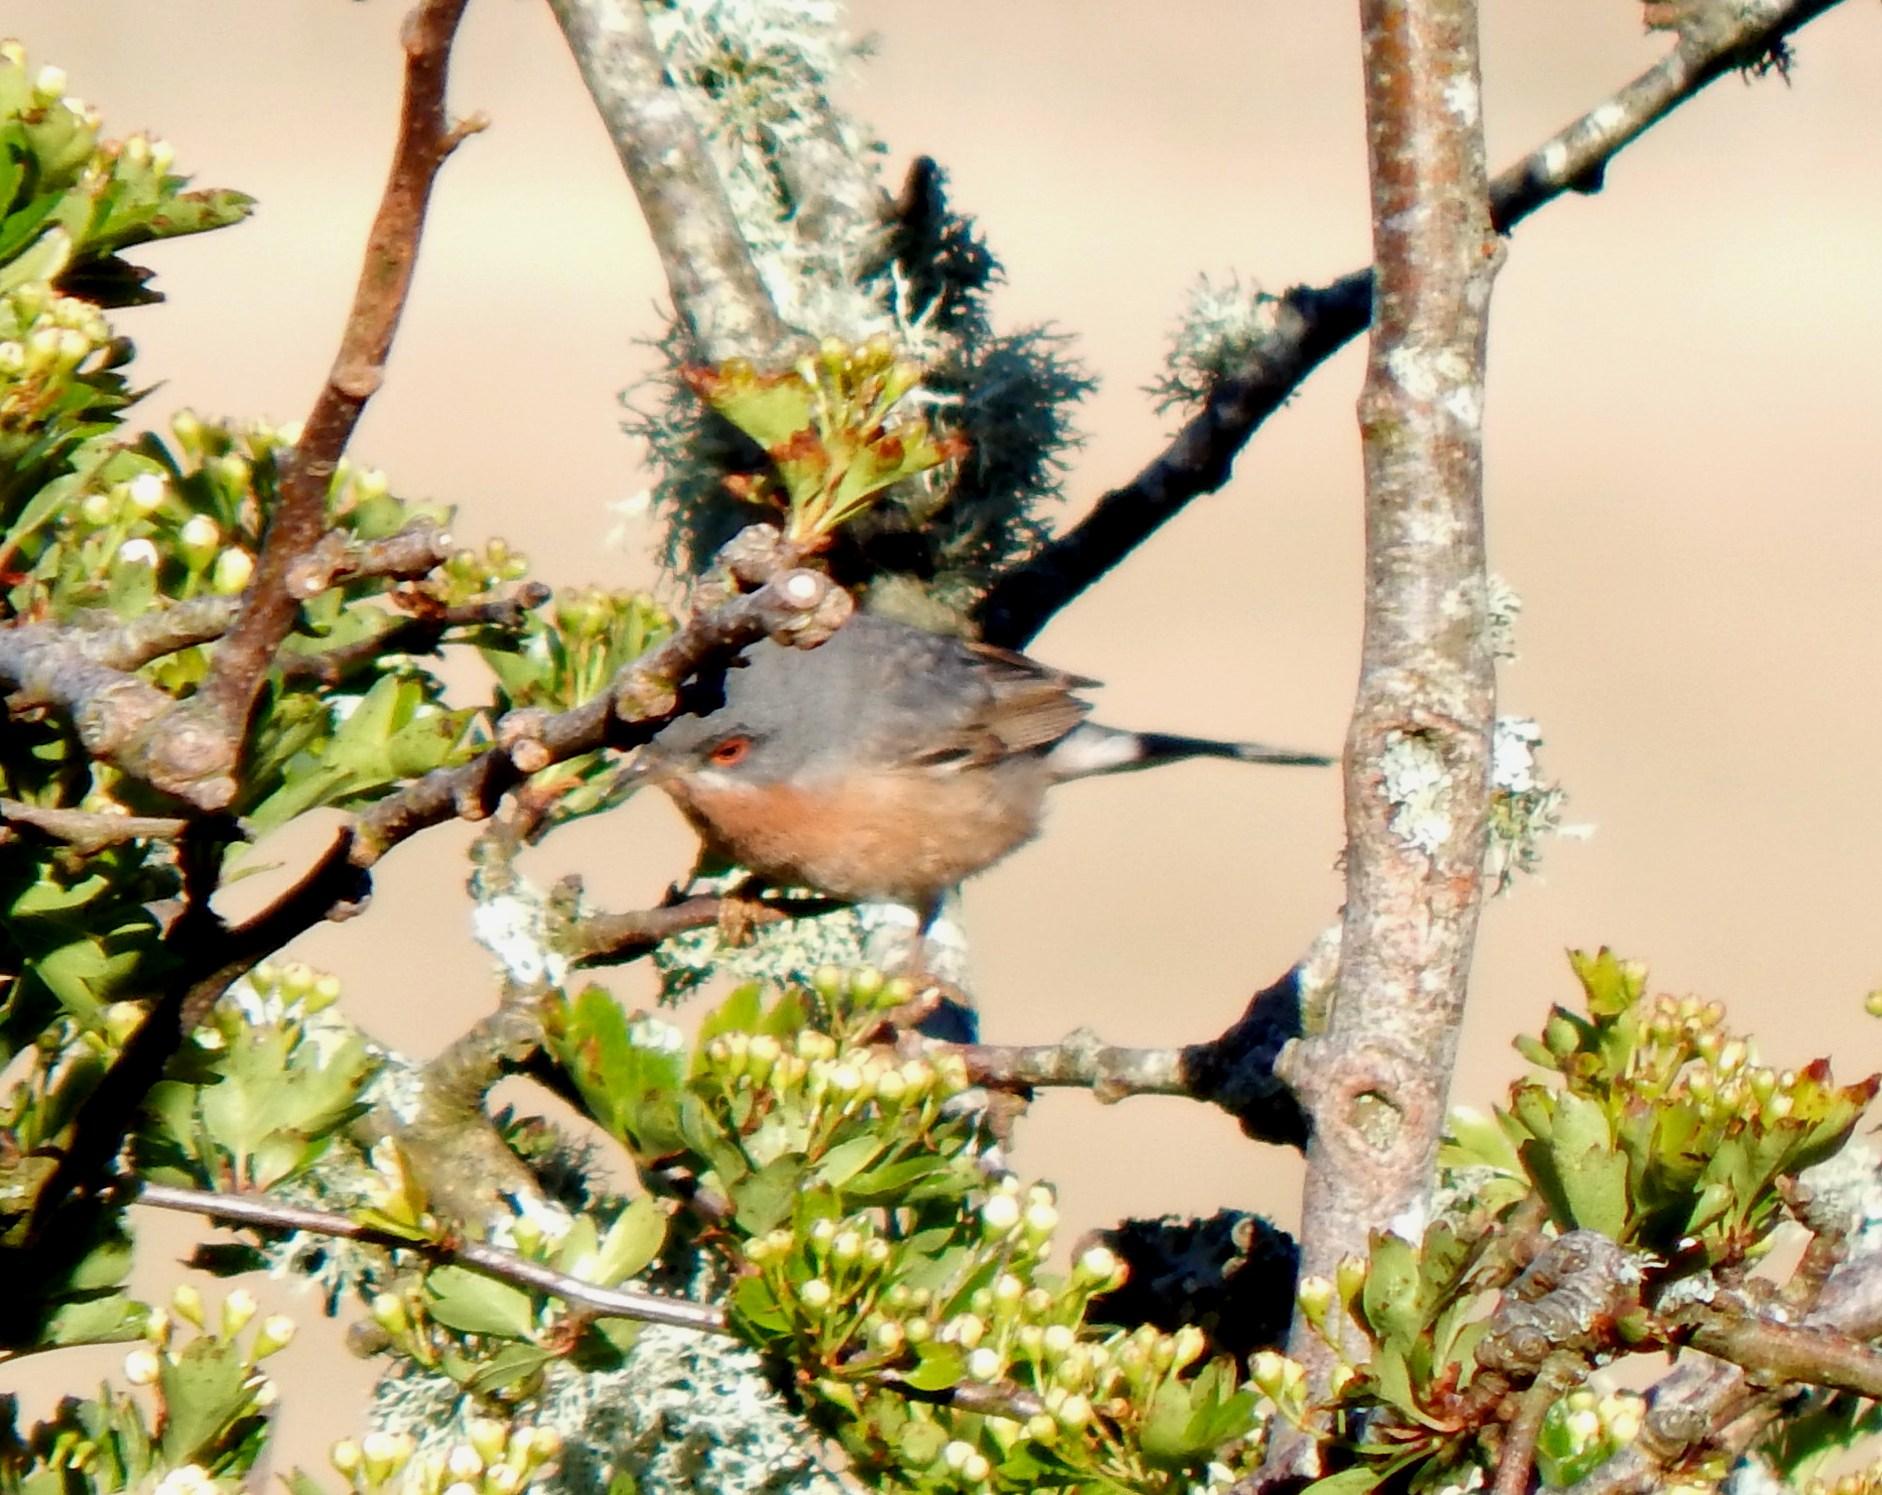 Western Subalpine Warbler